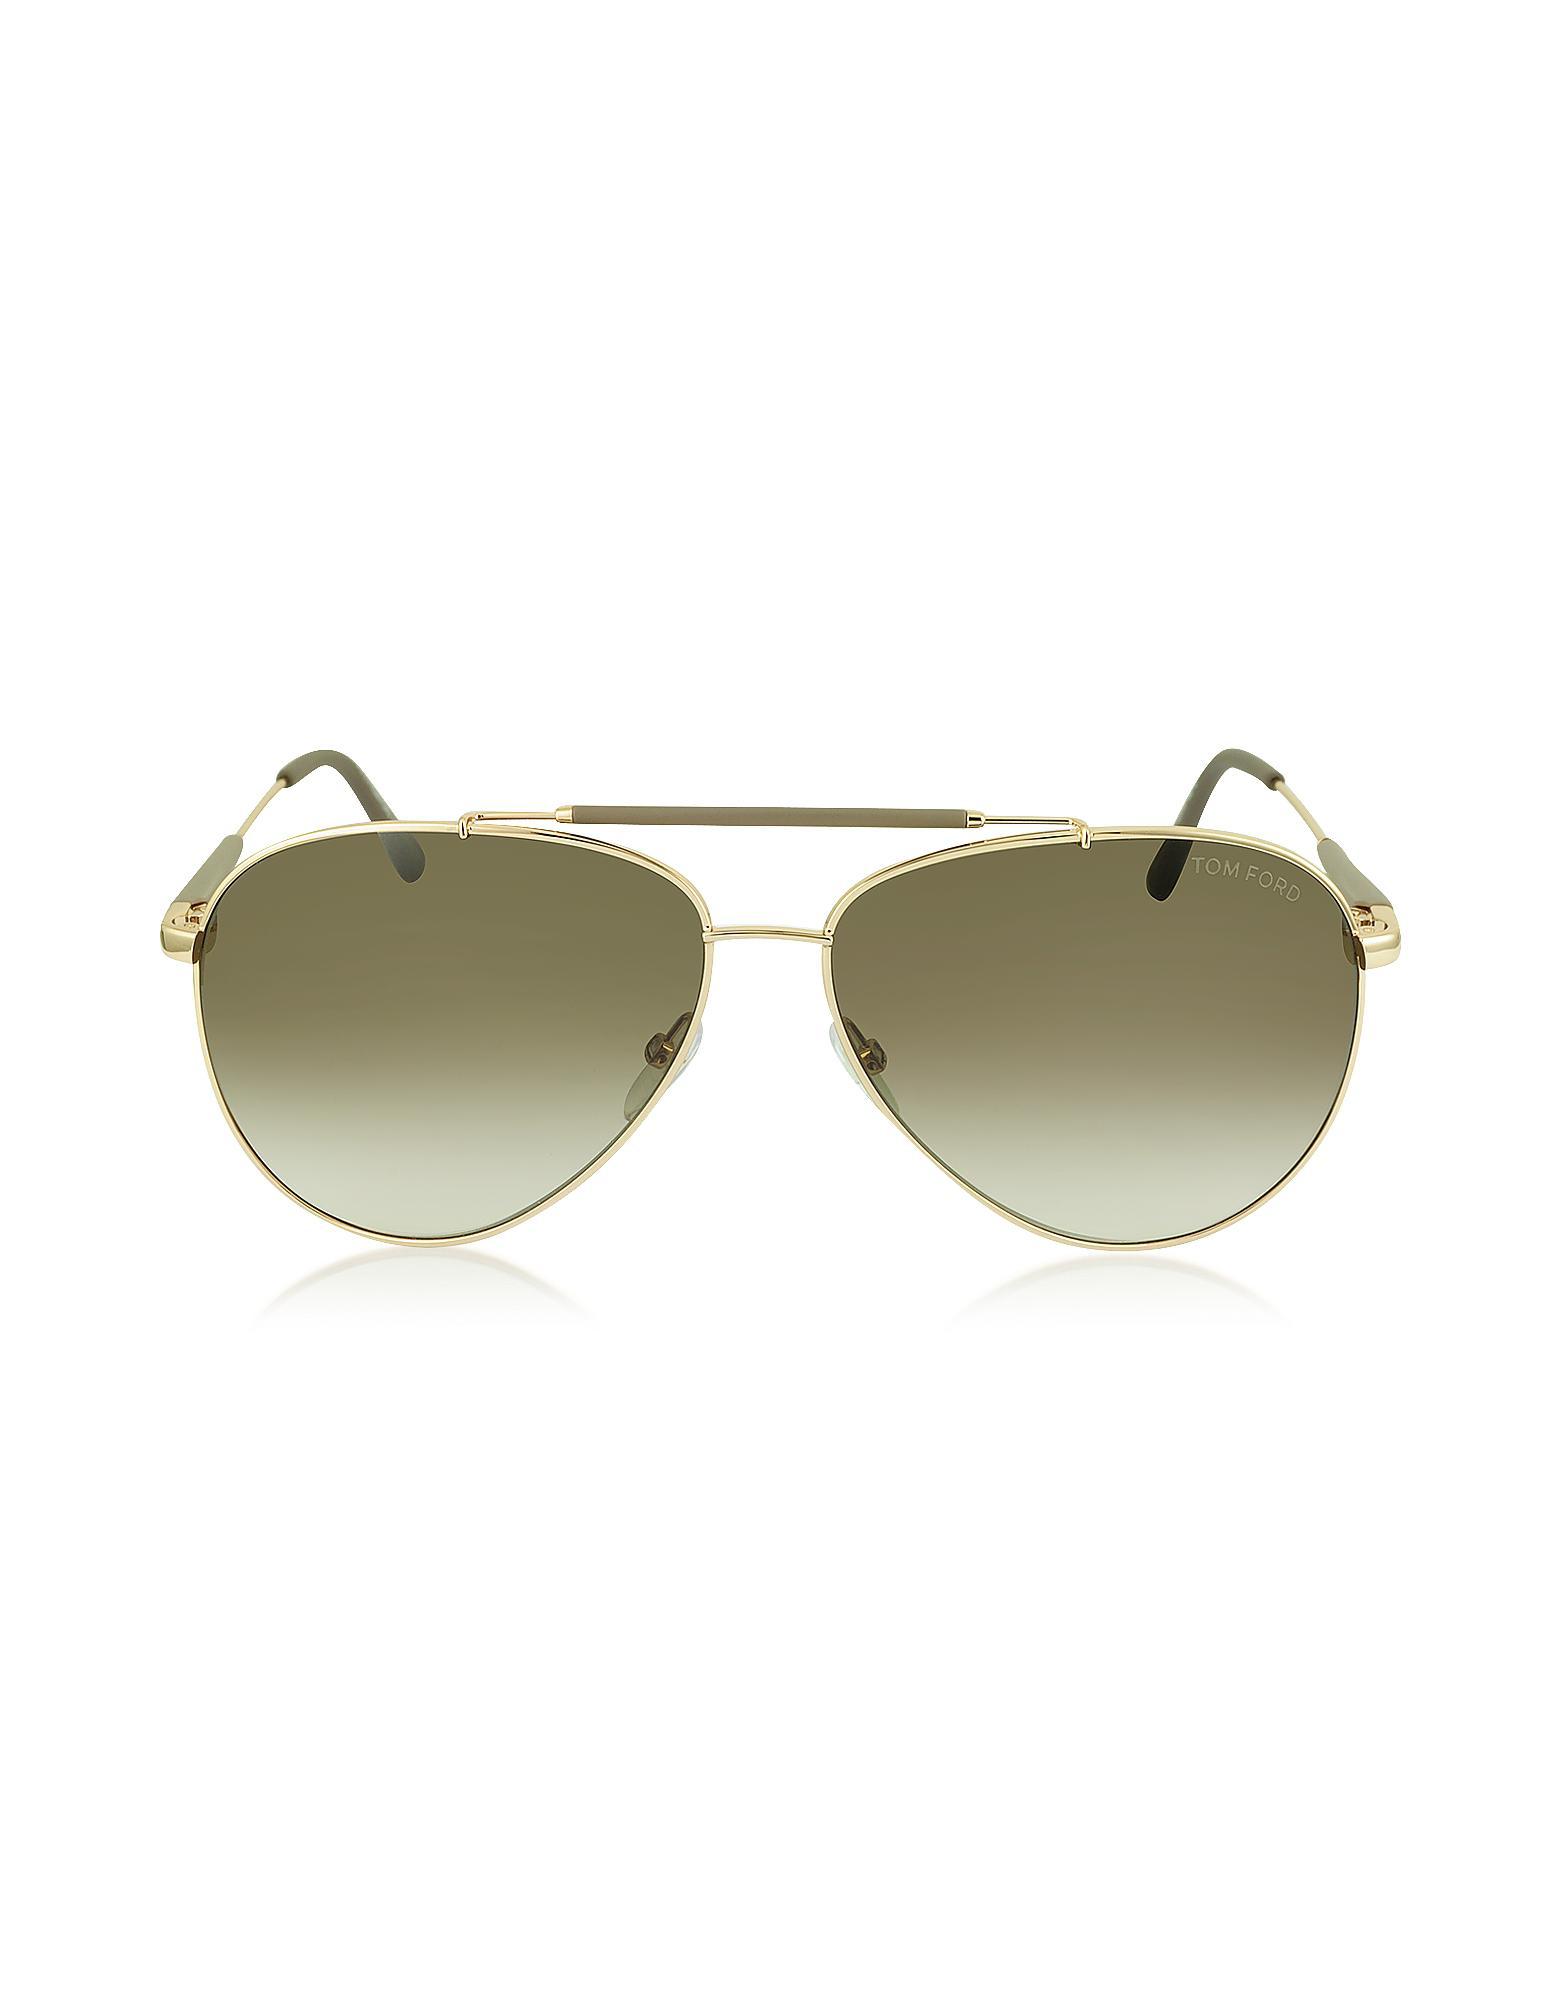 8cc912e6be9 Lyst - Tom Ford Rick Ft0378 28j Gold Brown Metal Aviator Sunglasses ...